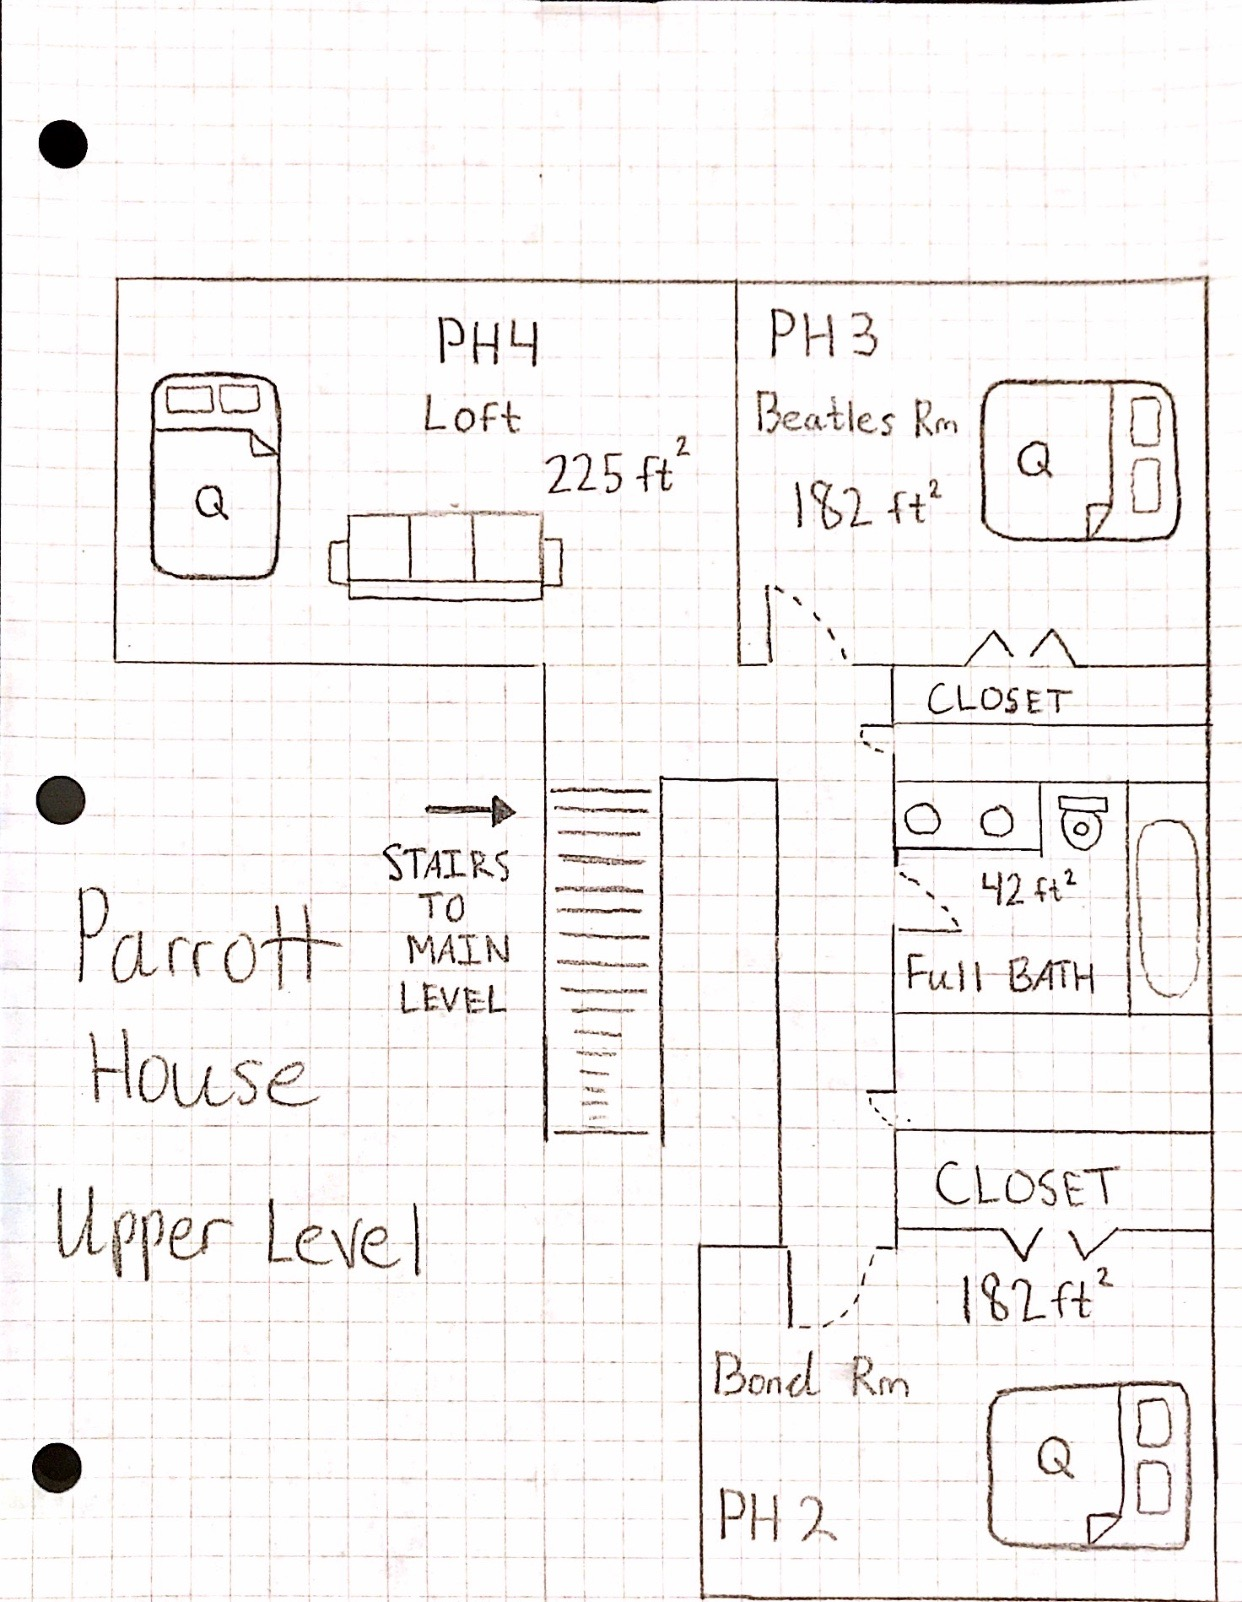 Parrot 2ND Floorplans (2).JPG